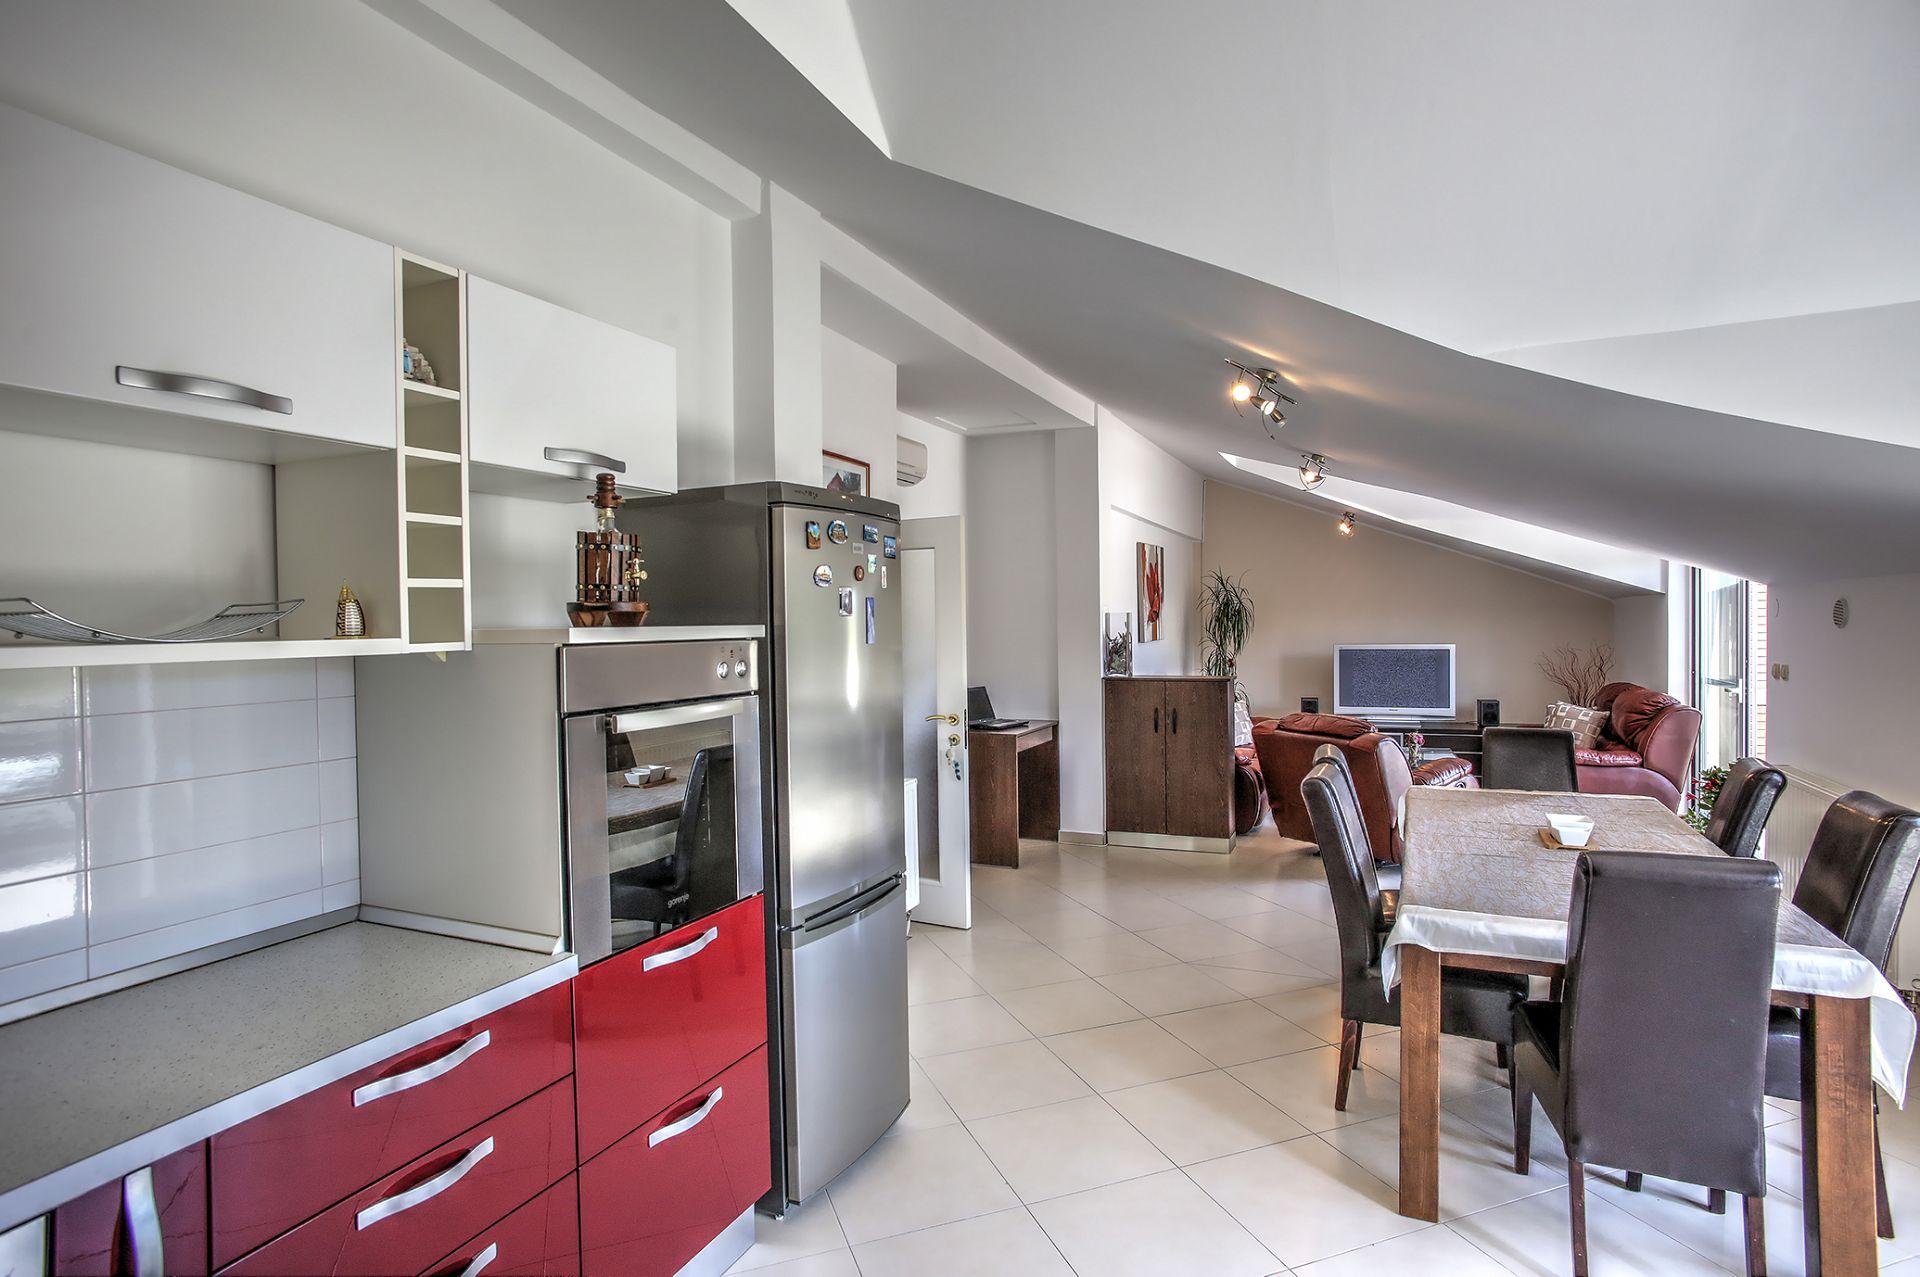 5409 - Jezera - Apartments Croatia - A5(4): kitchen and dining room